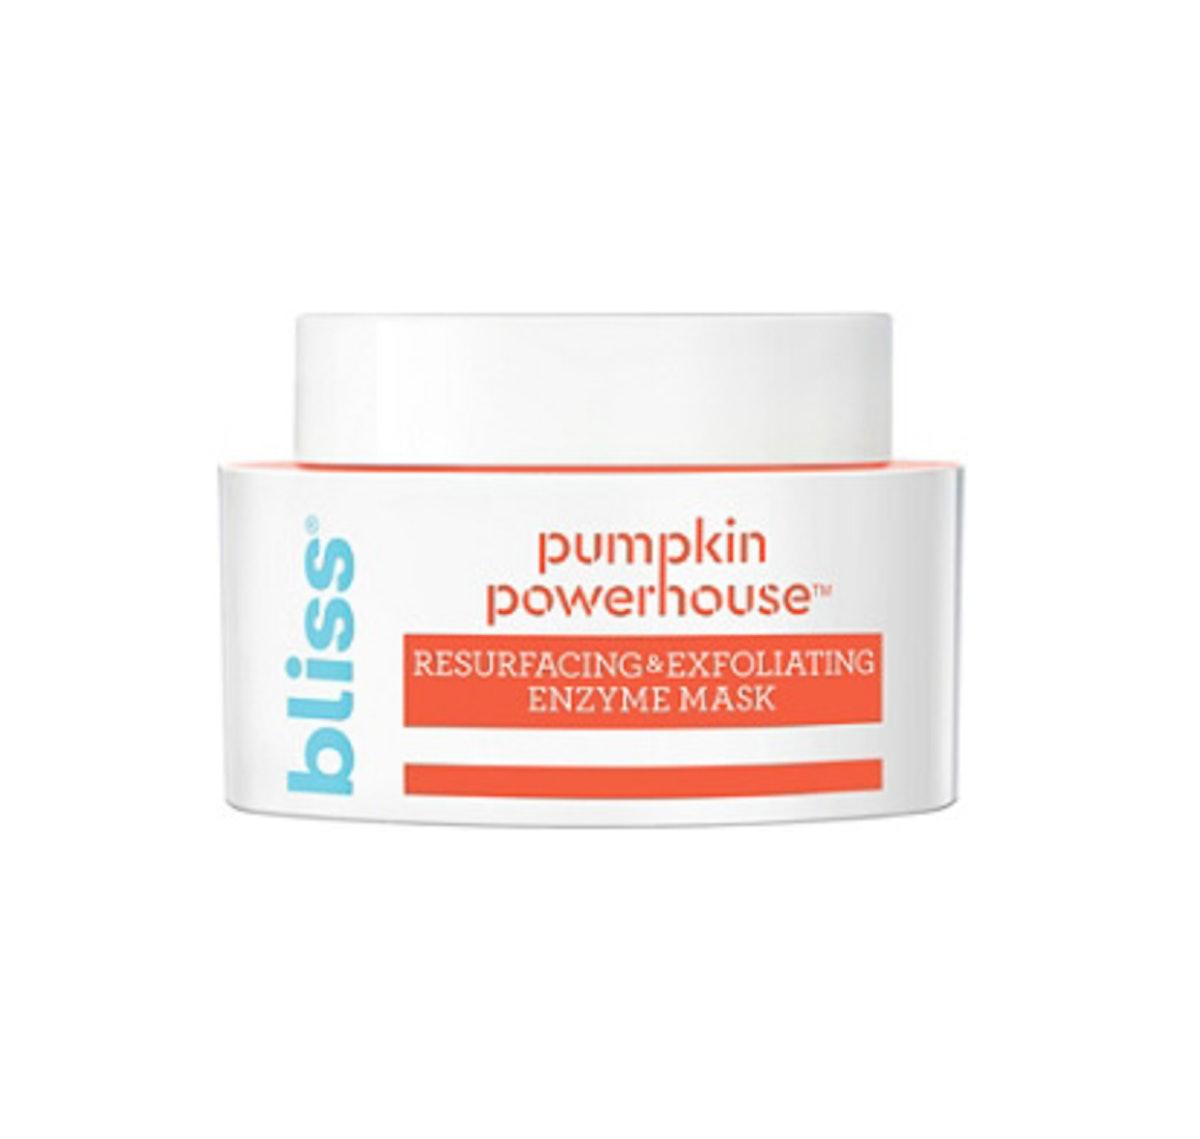 Pumpkin Powerhouse Resurfacing & Exfoliating Enzyme Mask